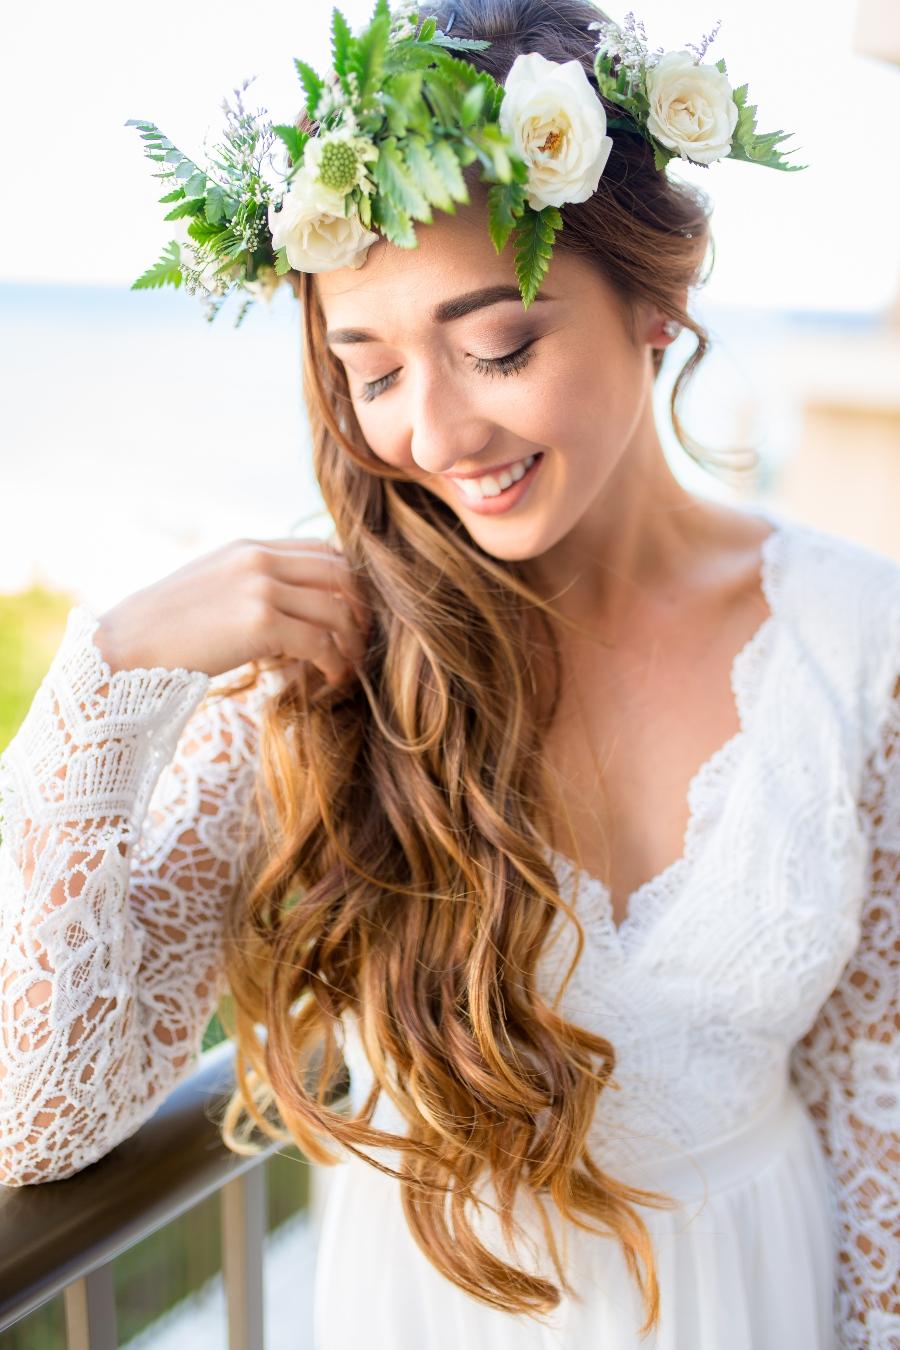 beach wedding attire for bride hair